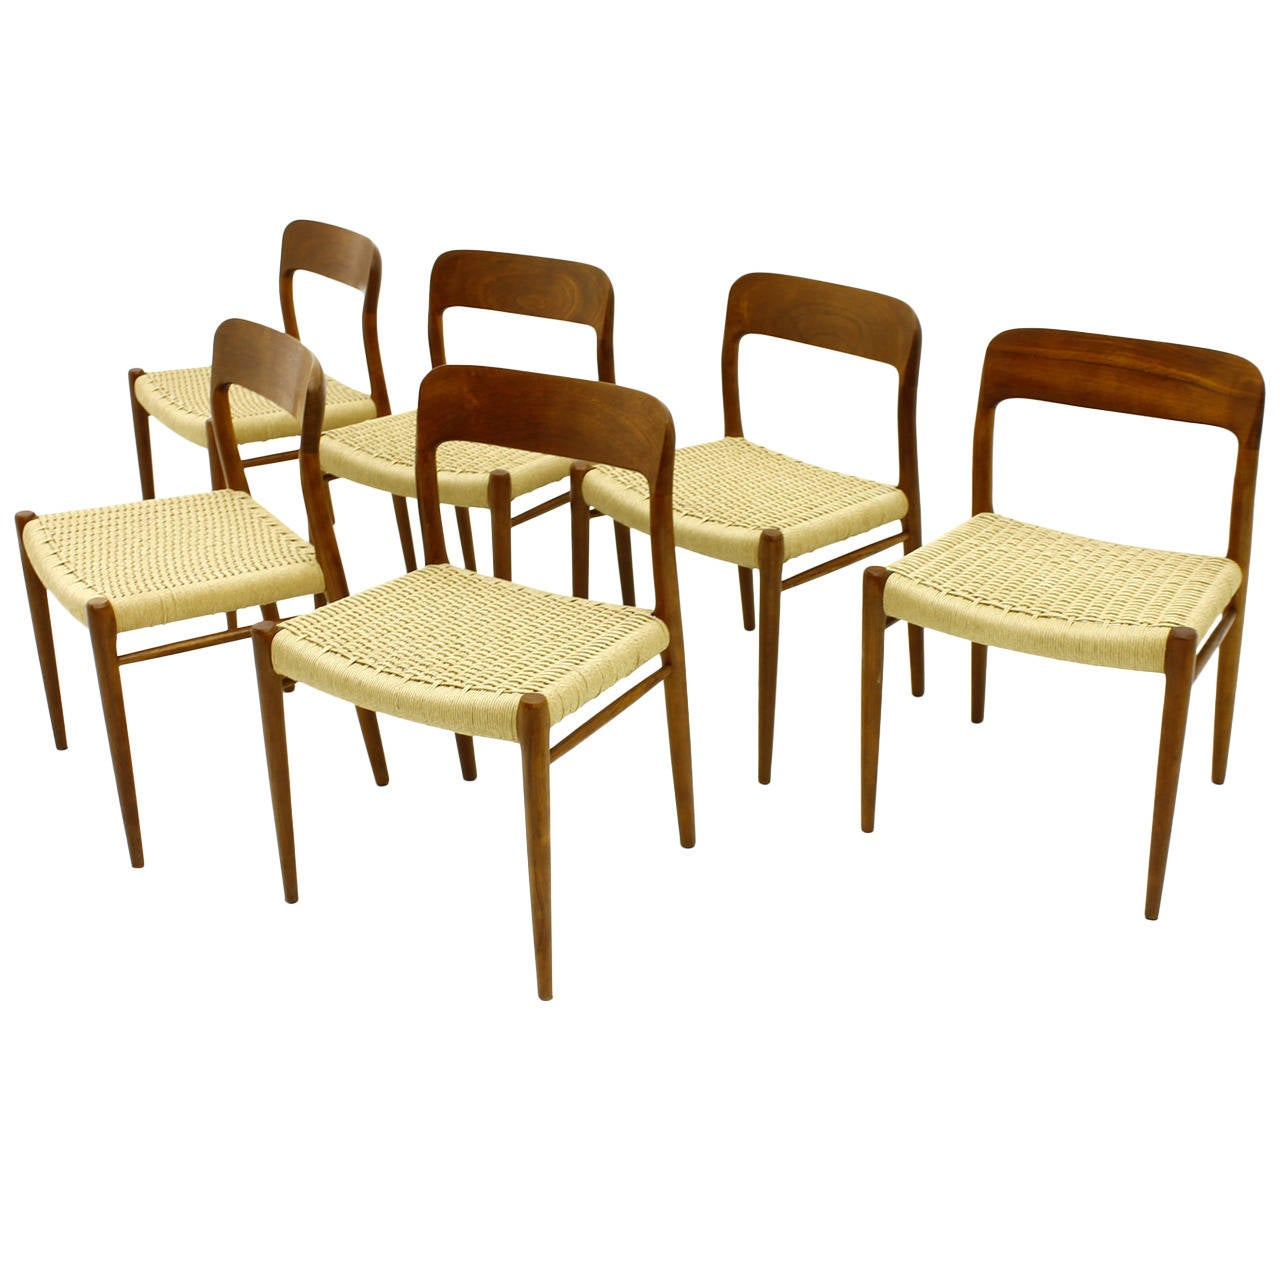 Set Of Six Niels O M Ller Teak Dining Room Chairs Model 75 Denmark 1960 S